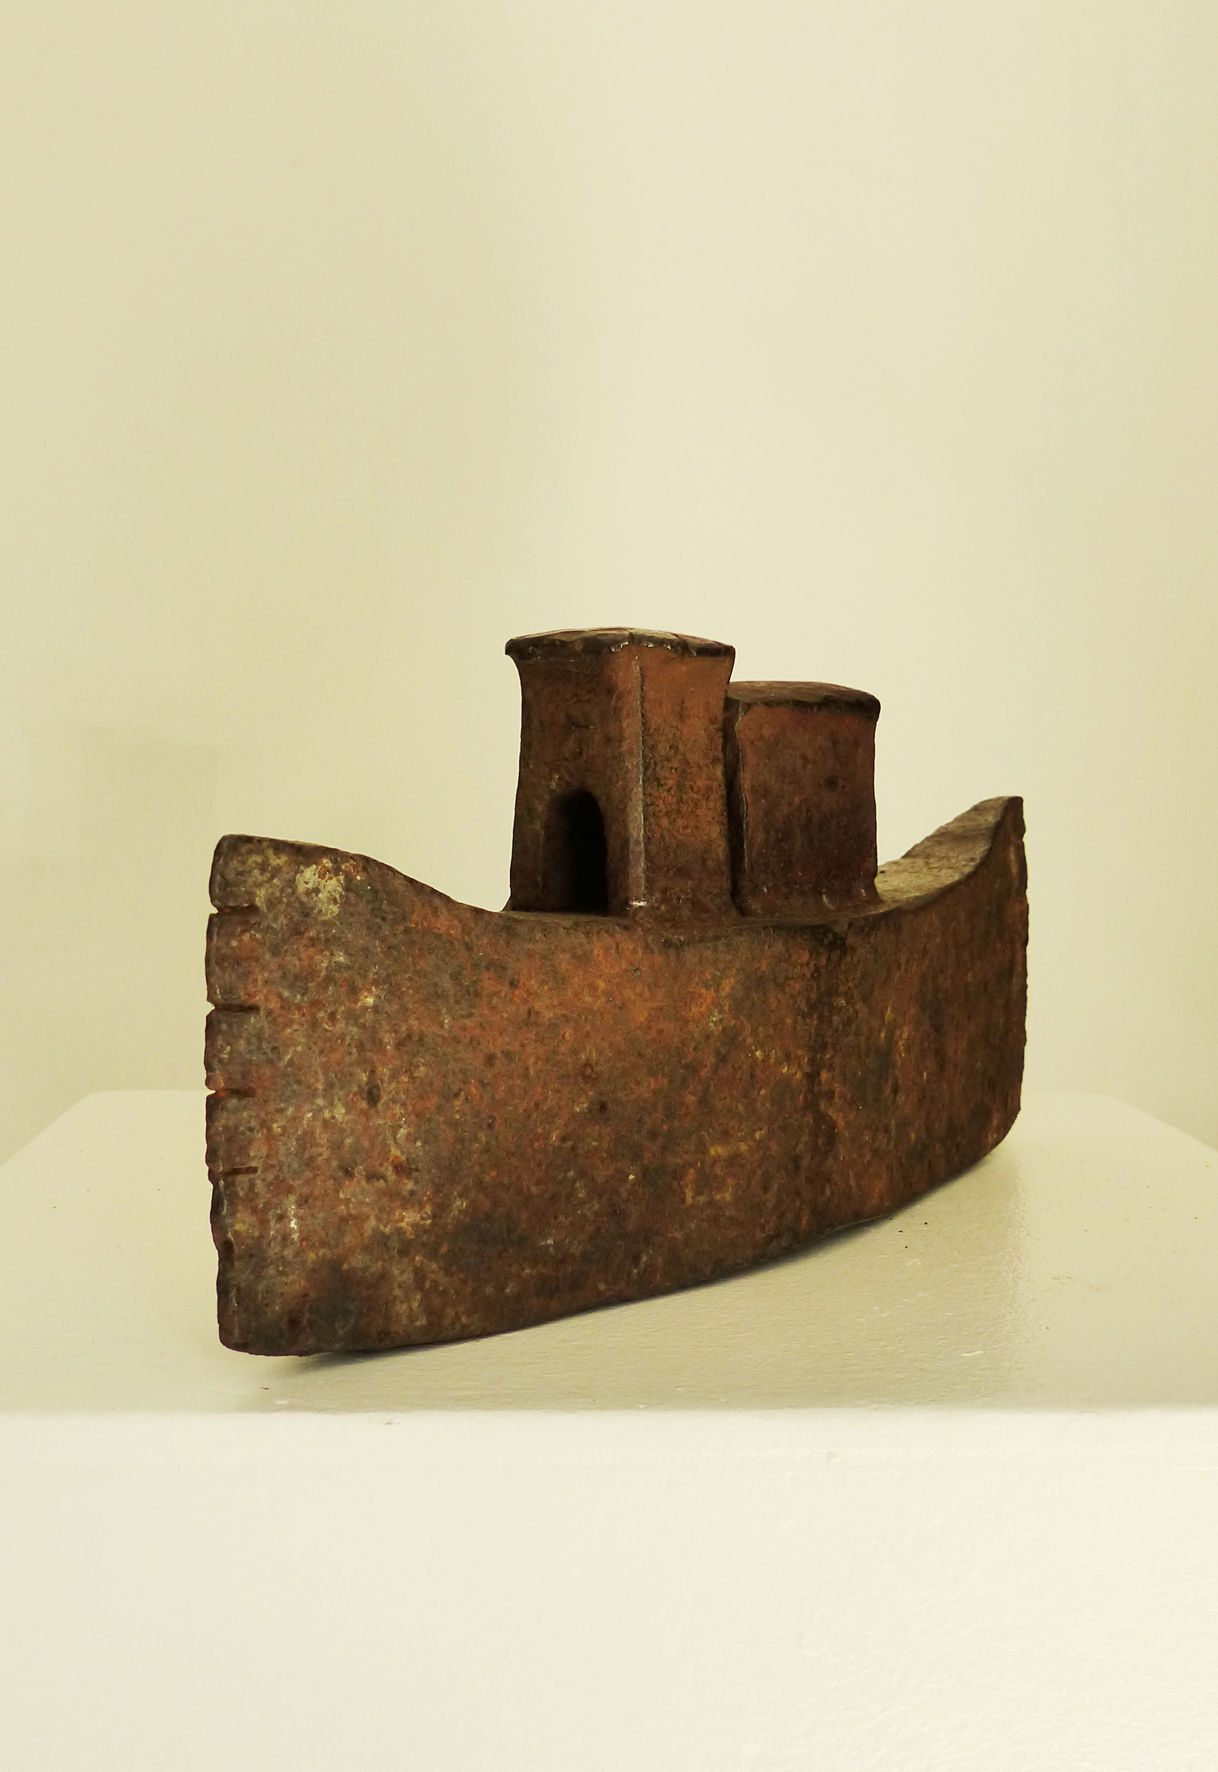 Boot   boat  2013  Stahlschrott, geschweißt   scrapmetal, welded  10x23x5 cm  verkauft   sold